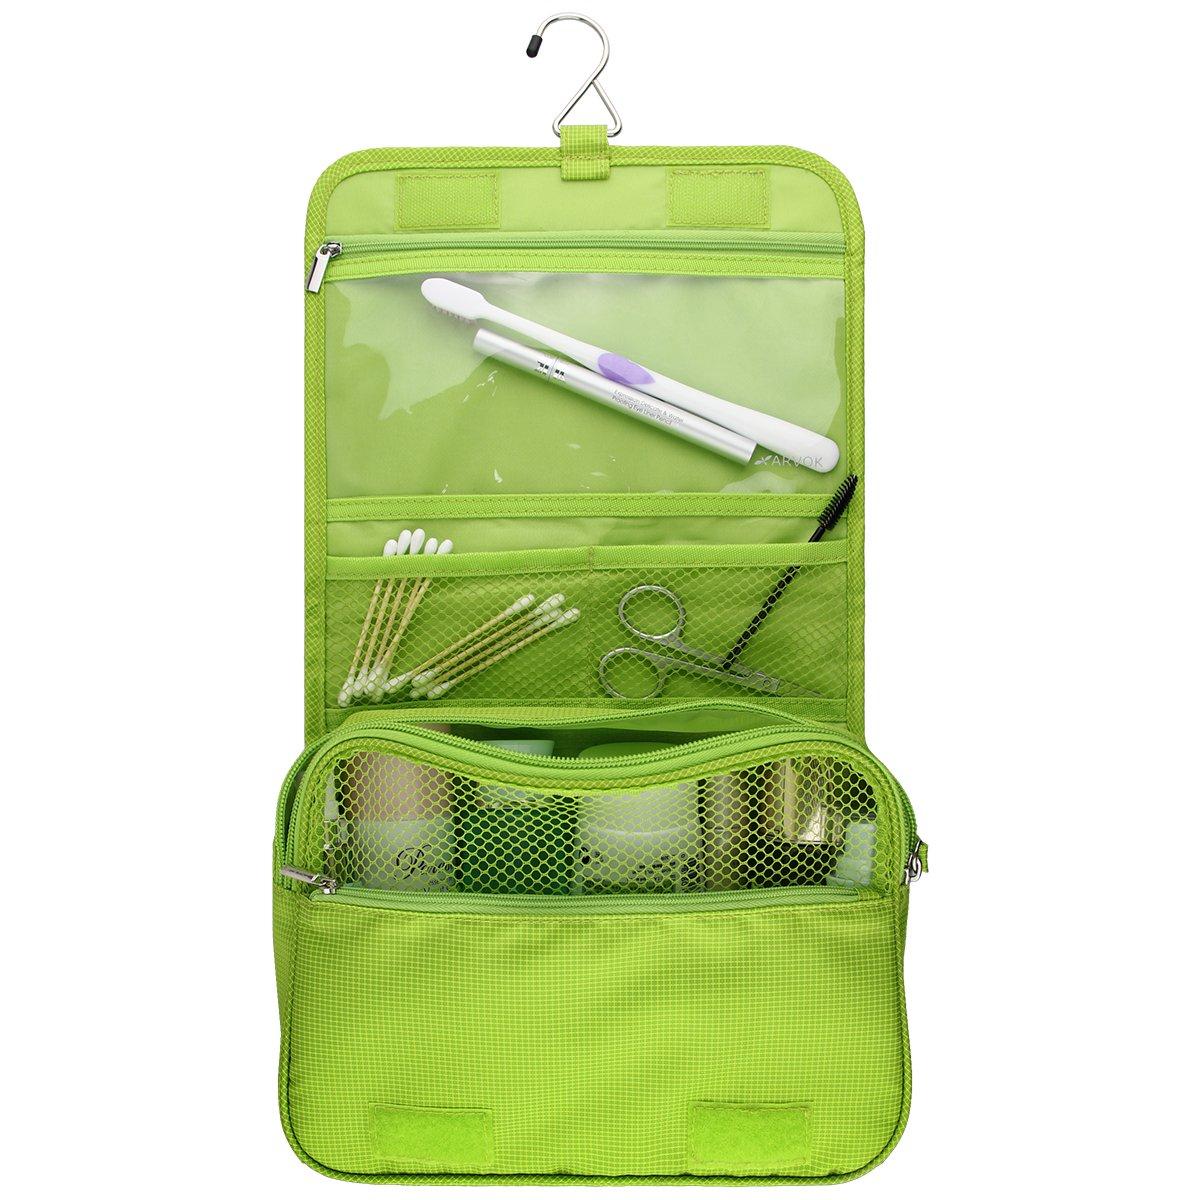 5fdea05bdd Arvok Travel Toiletry Bag with Metal Hanging Waterproof Storage Organizer